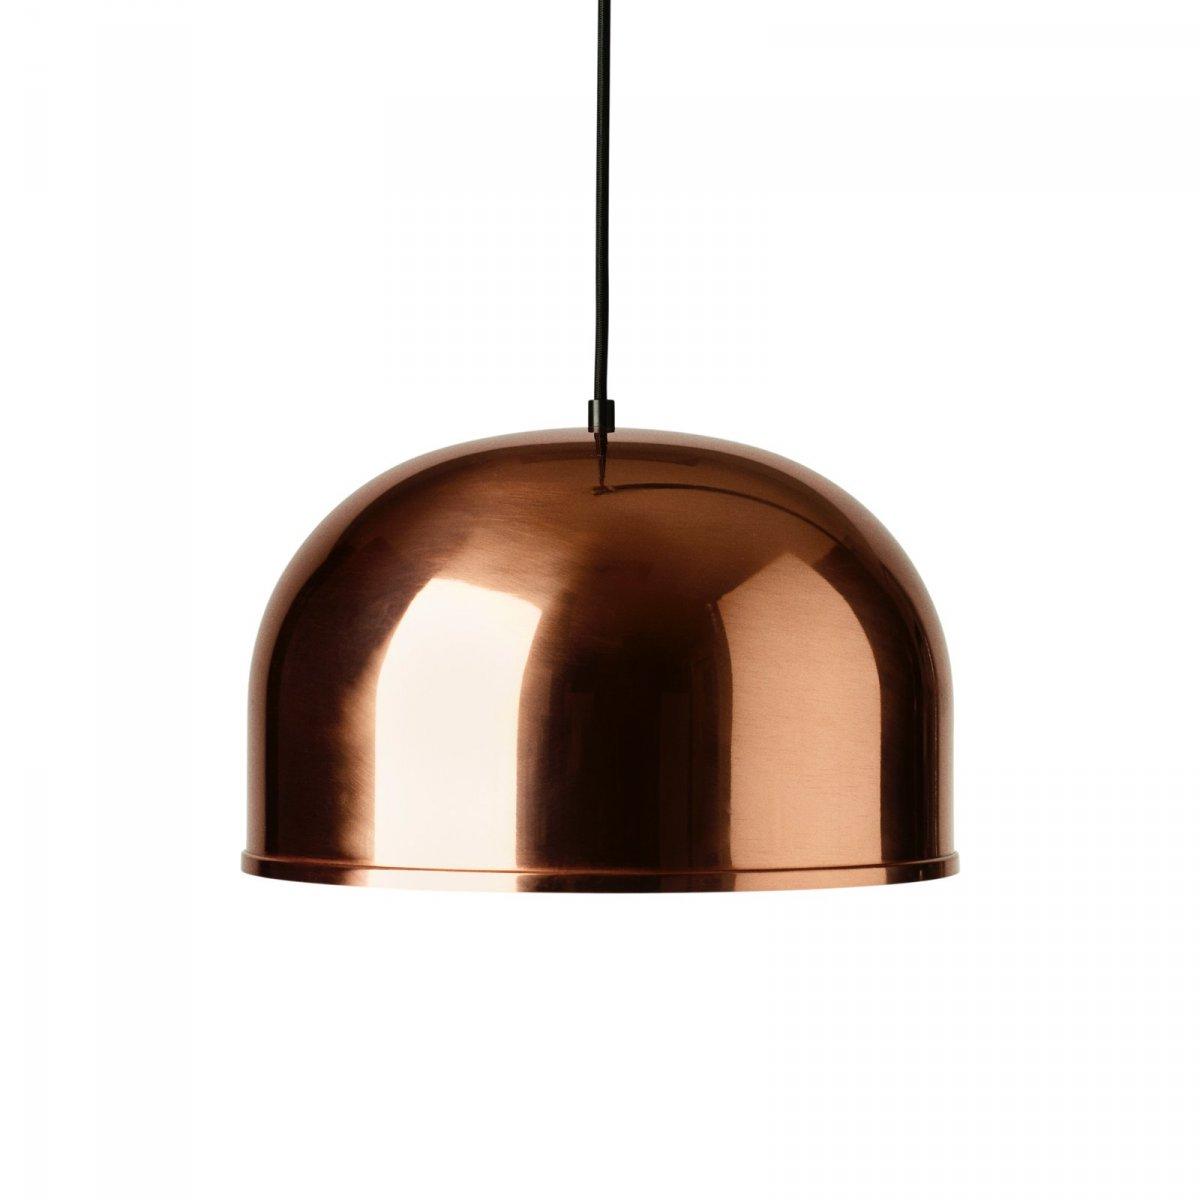 GM 30 Pendant lamp, copper.